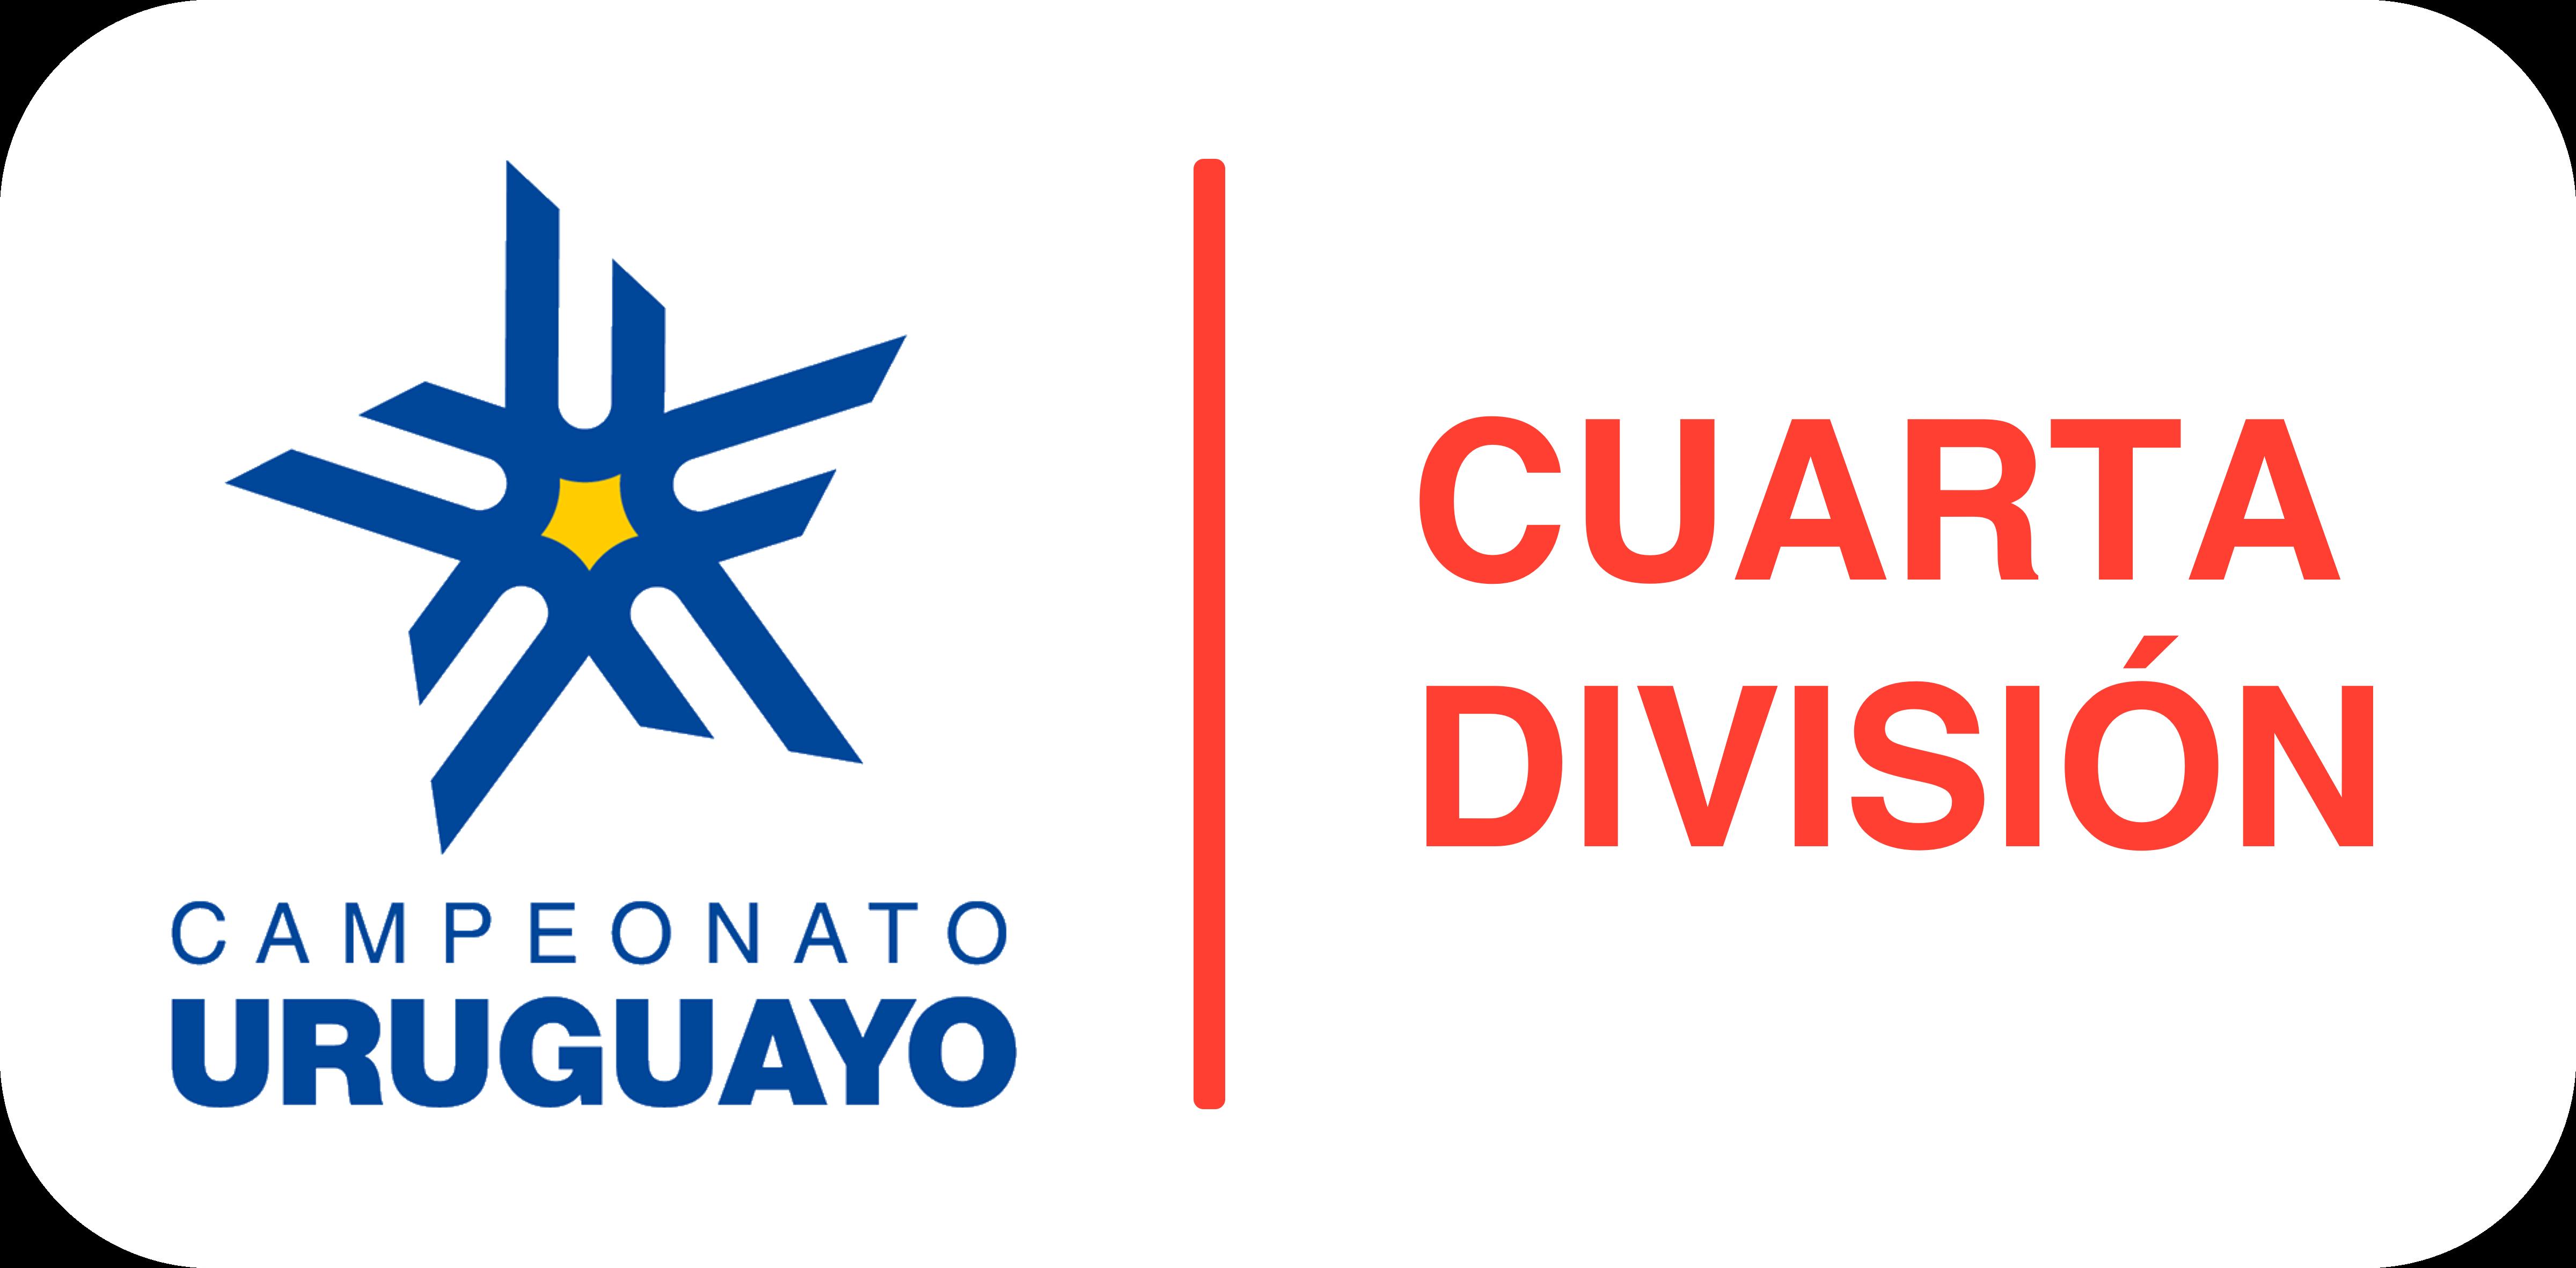 File:Logo Campeonato Uruguayo Cuarta División.png - Wikimedia Commons